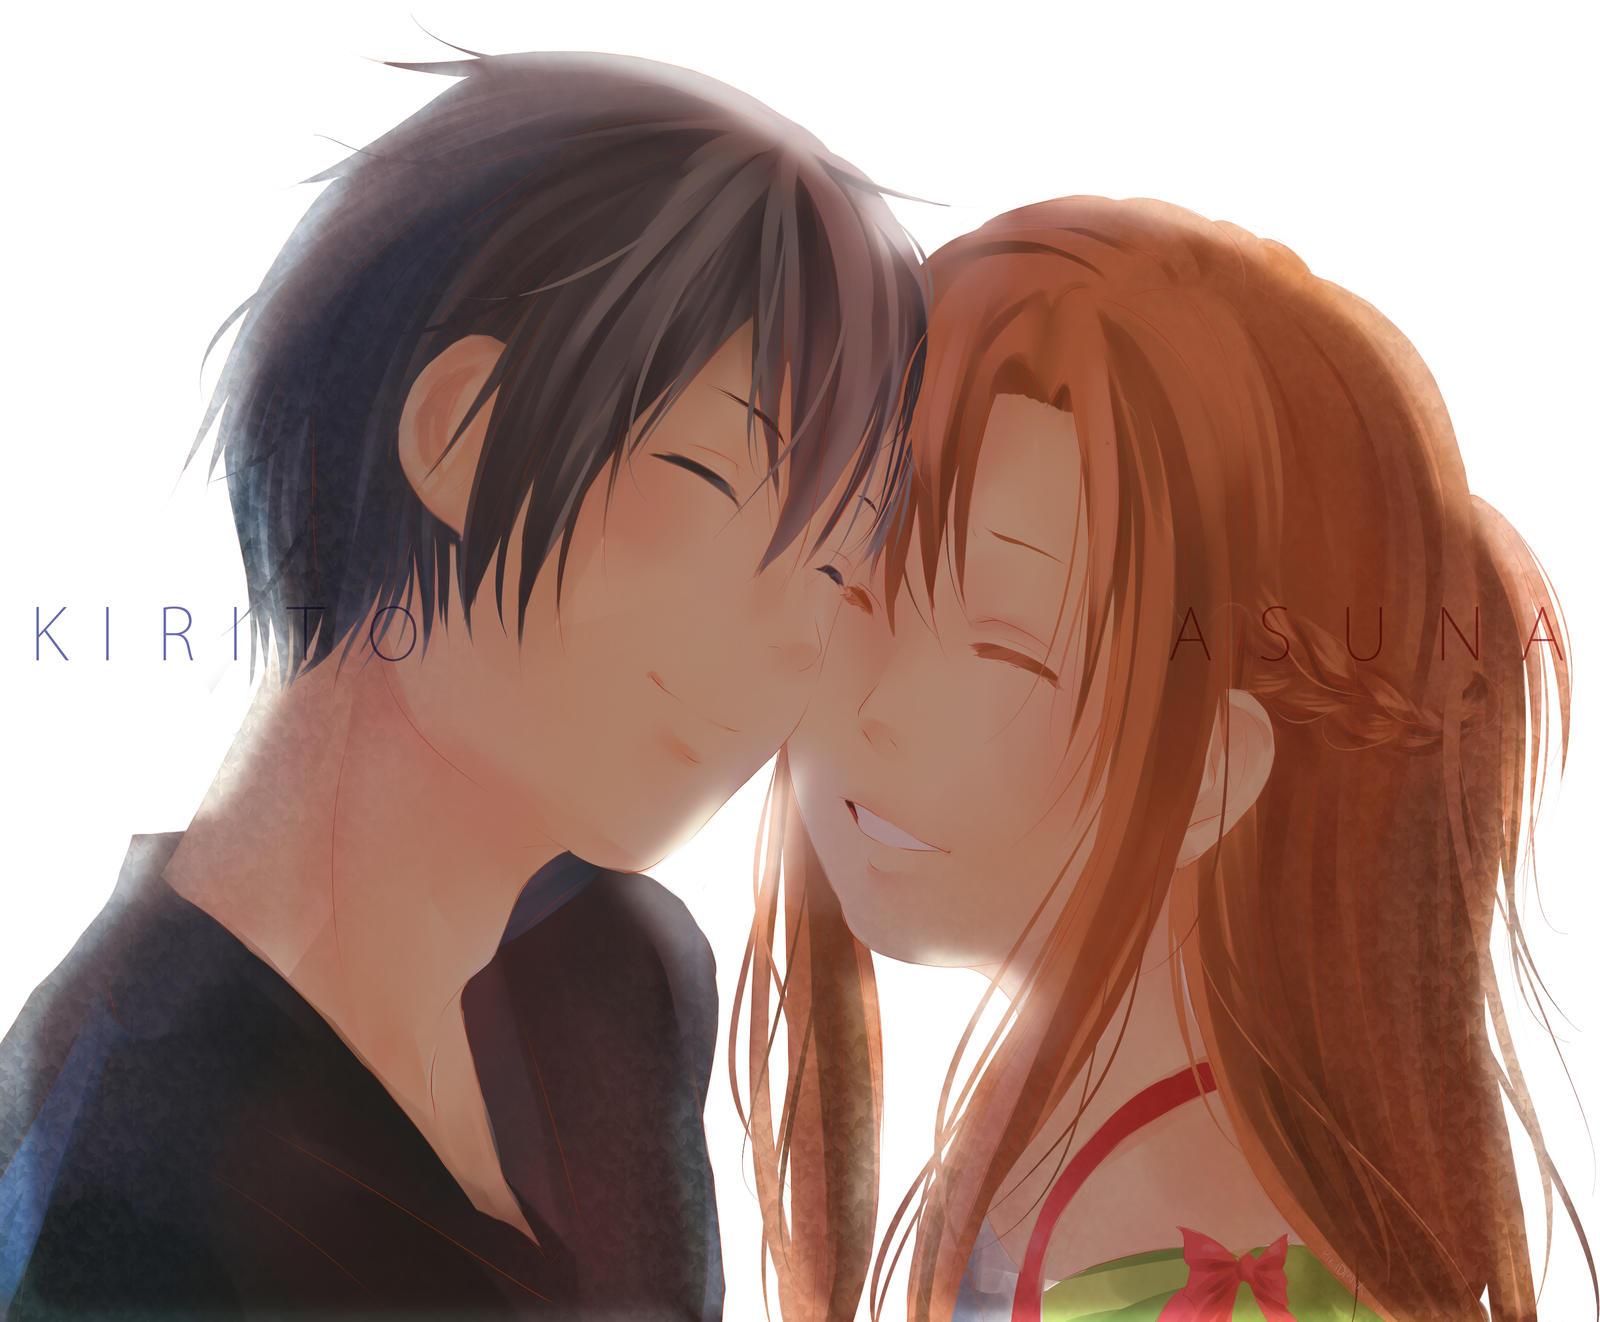 SAO: Kirito and Asuna by pikadiana